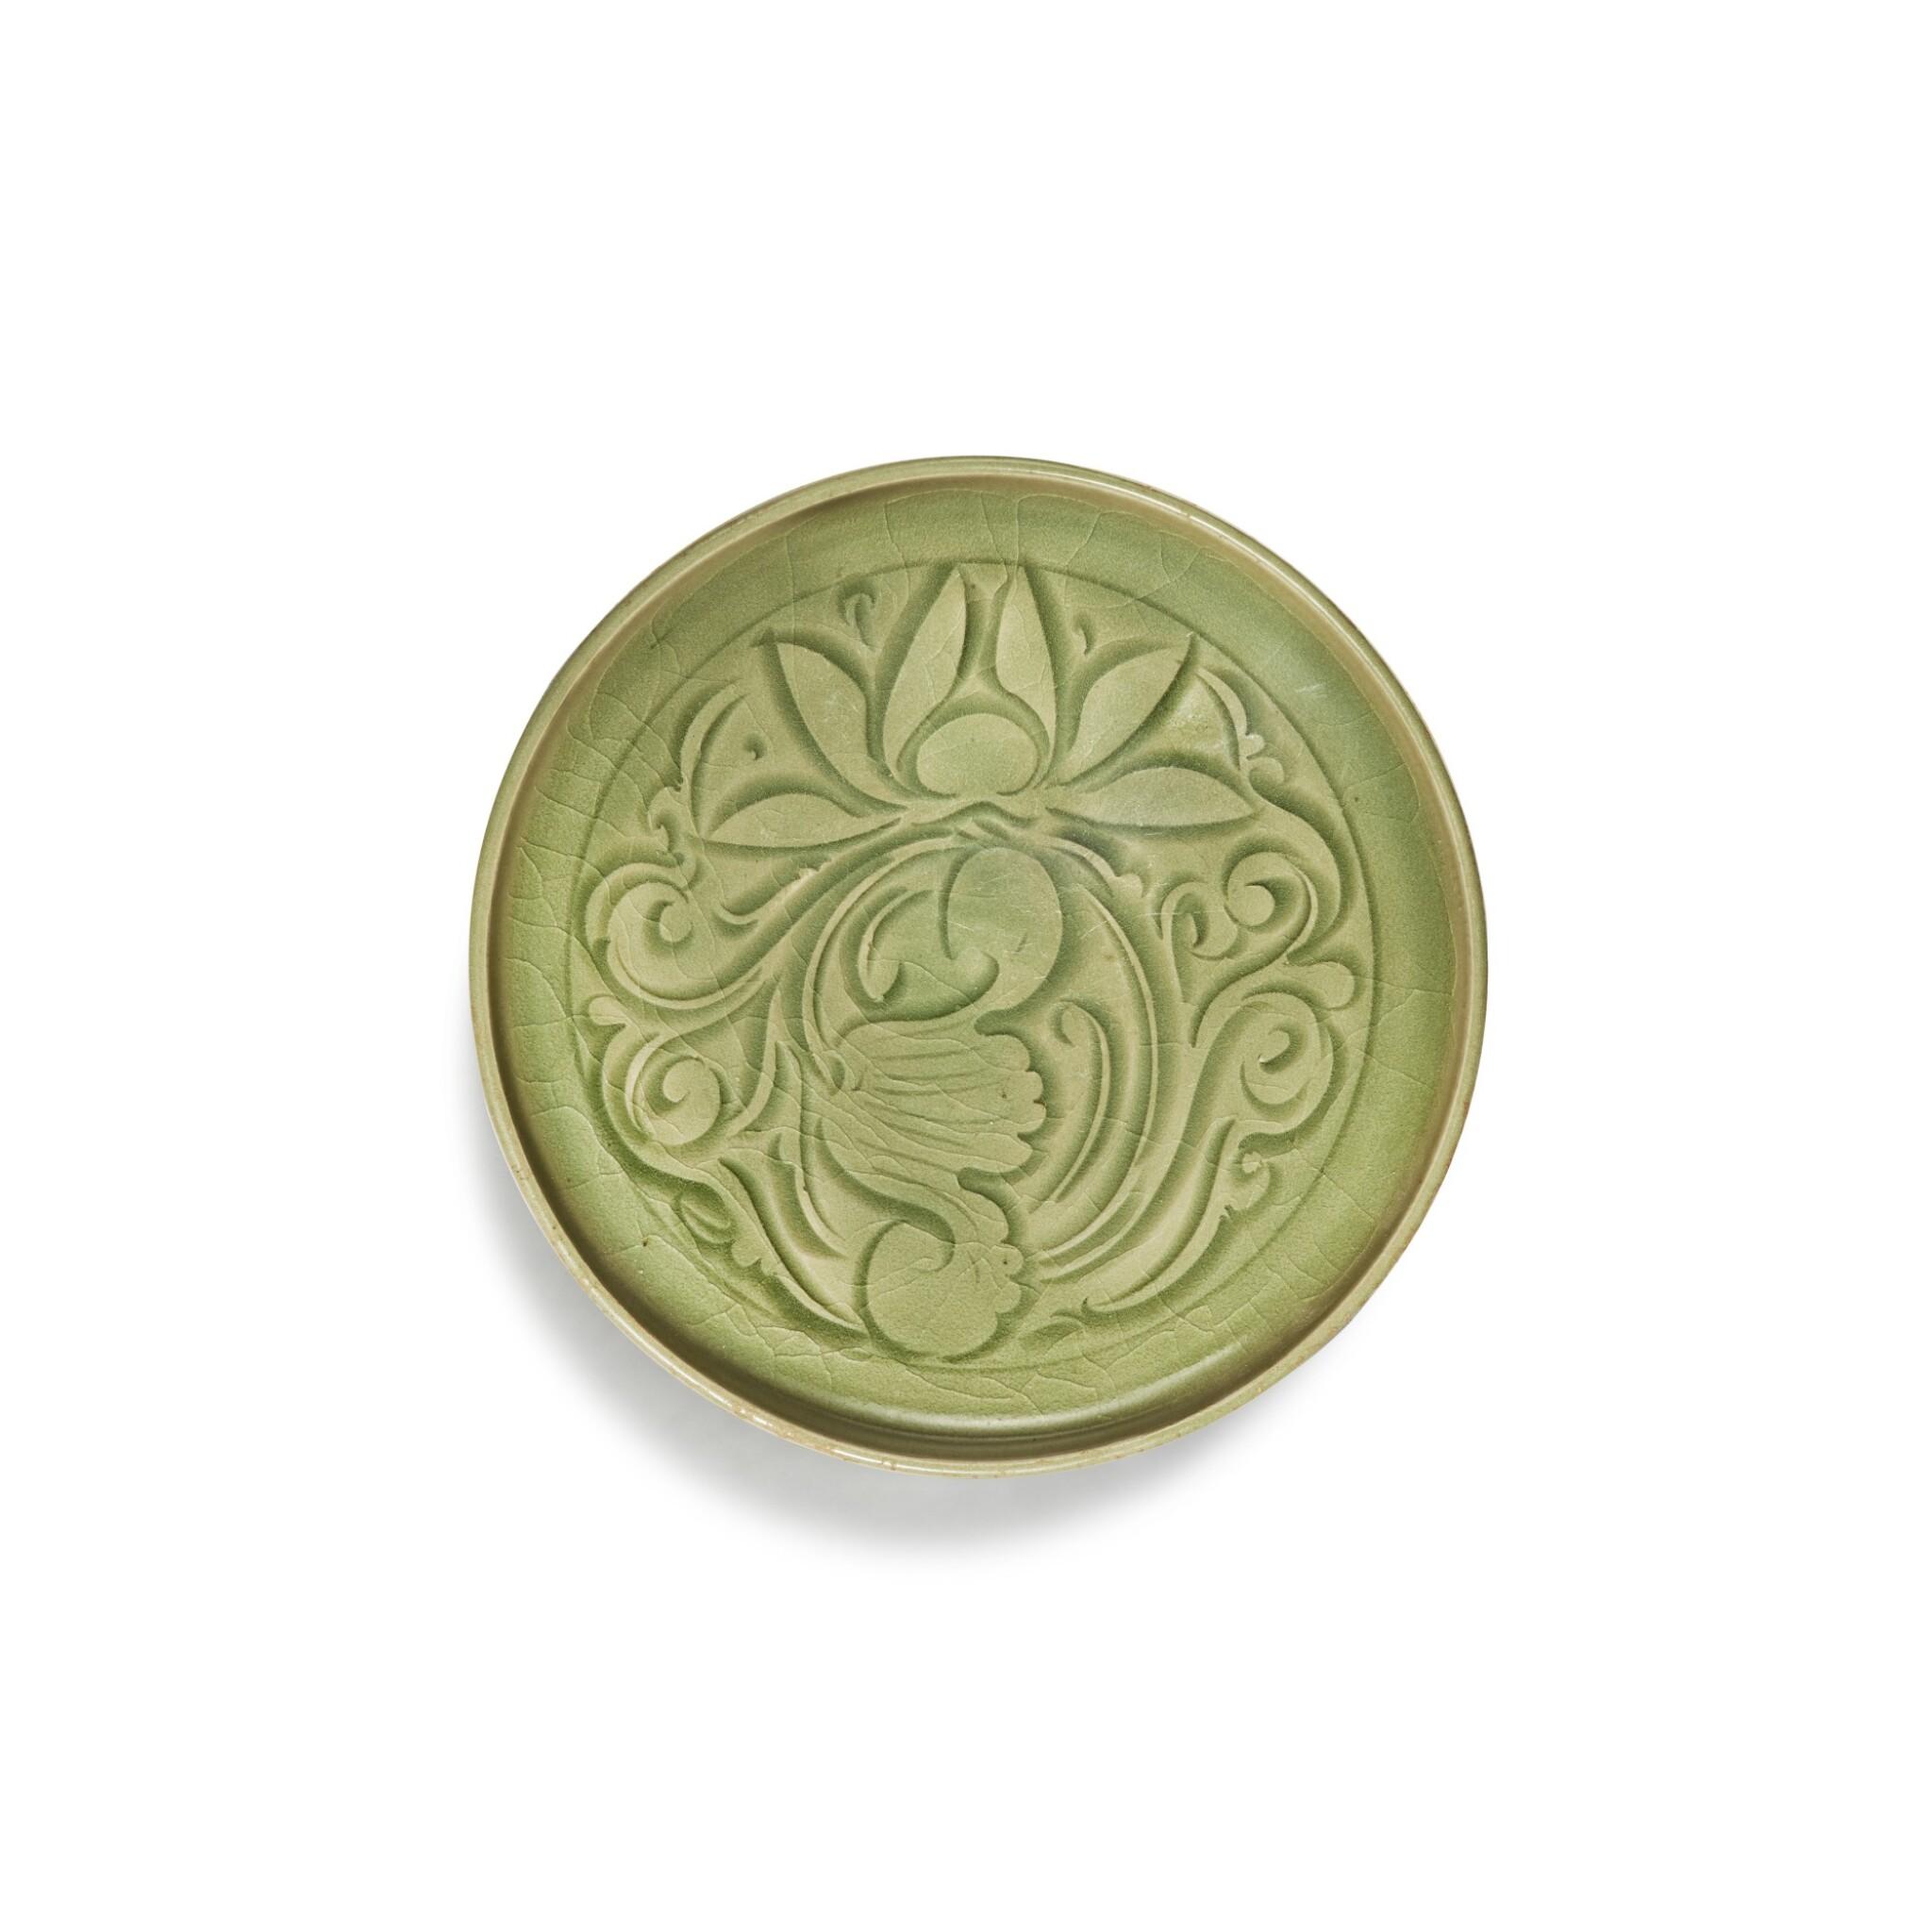 View full screen - View 1 of Lot 95. A carved 'Yaozhou' celadon-glazed dish, Northern Song / Jin dynasty   北宋 / 金 耀州窰青釉刻蓮紋盤.